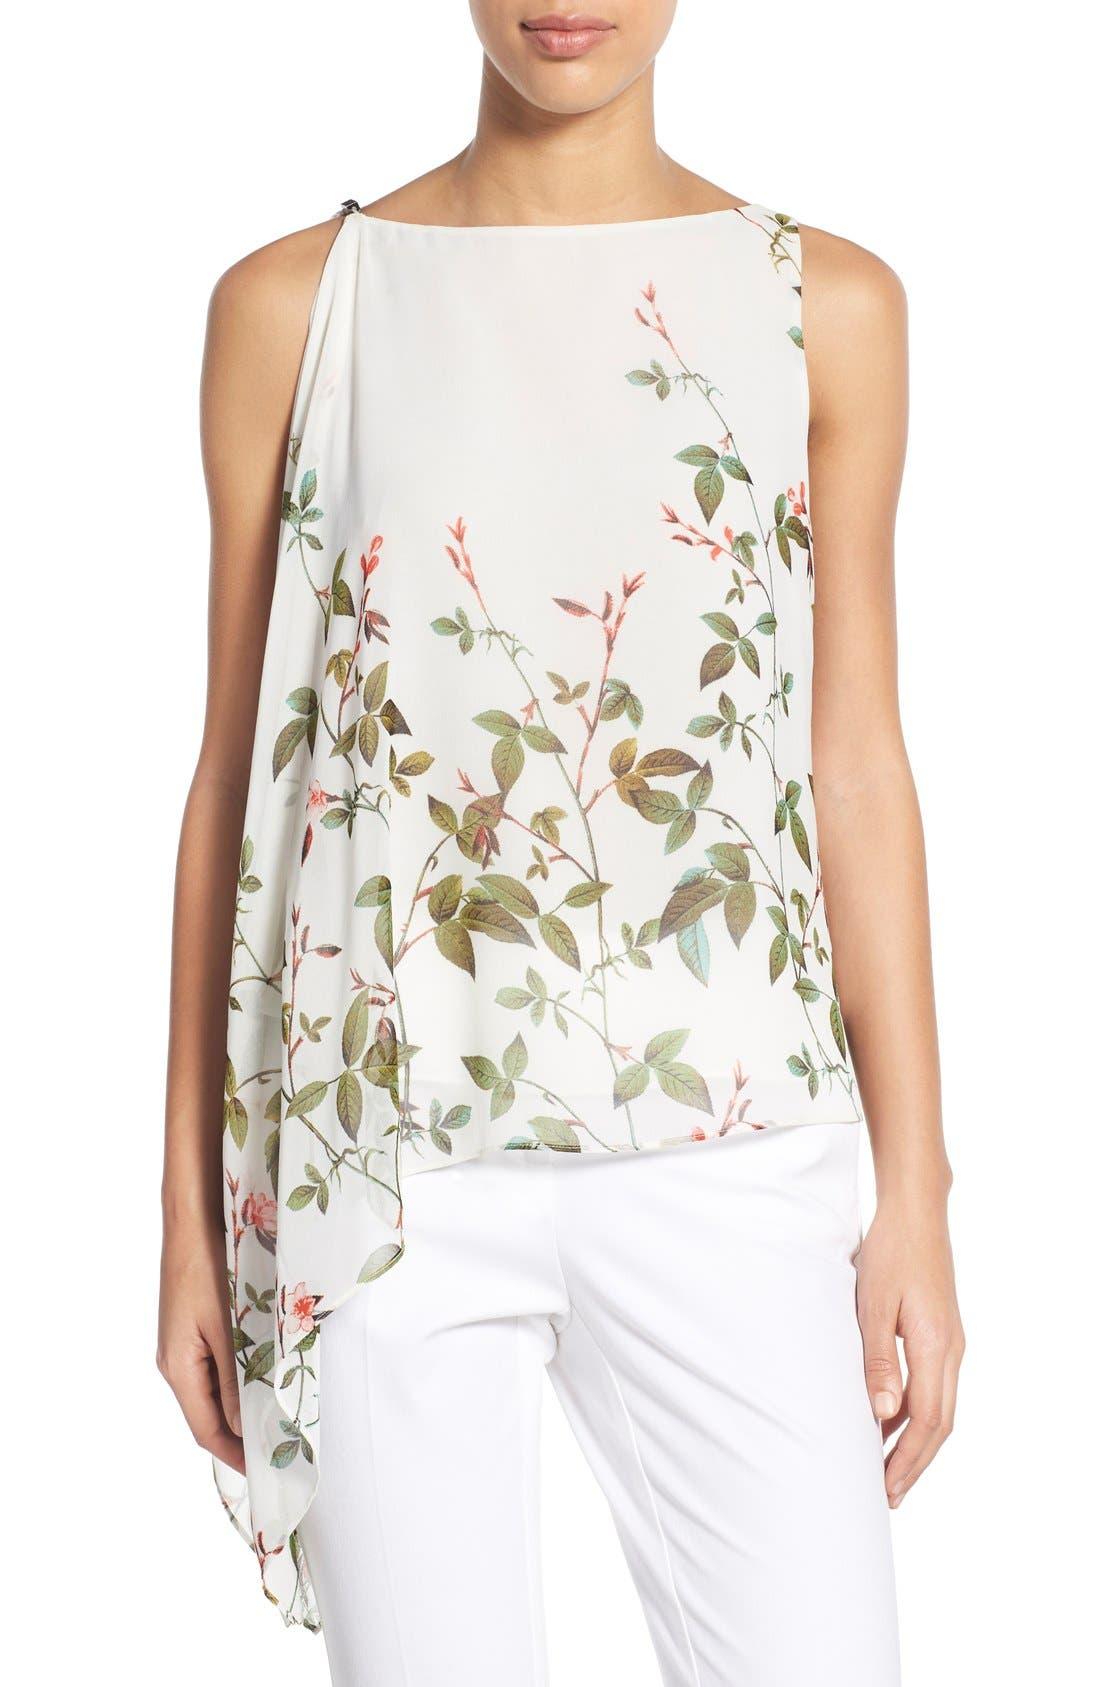 Main Image - Adrianna Papell Floral Print Asymmetrical Chiffon Blouse